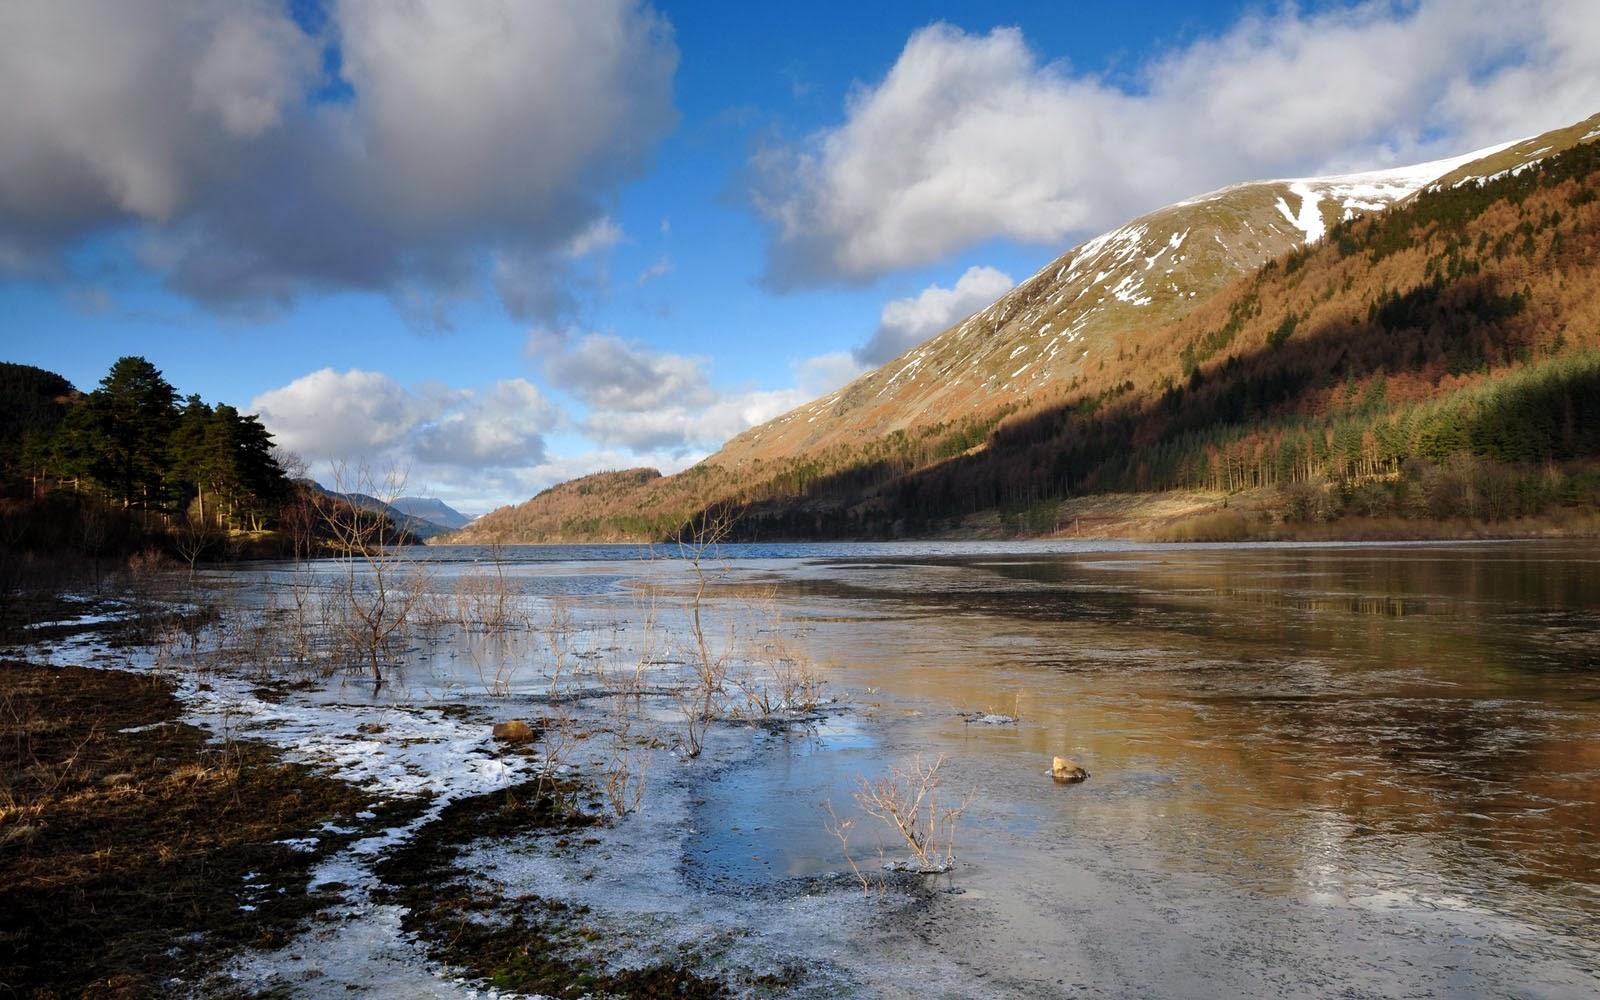 Windows Xp 3d Wallpaper Free Download Wallpapers Lake District National Park